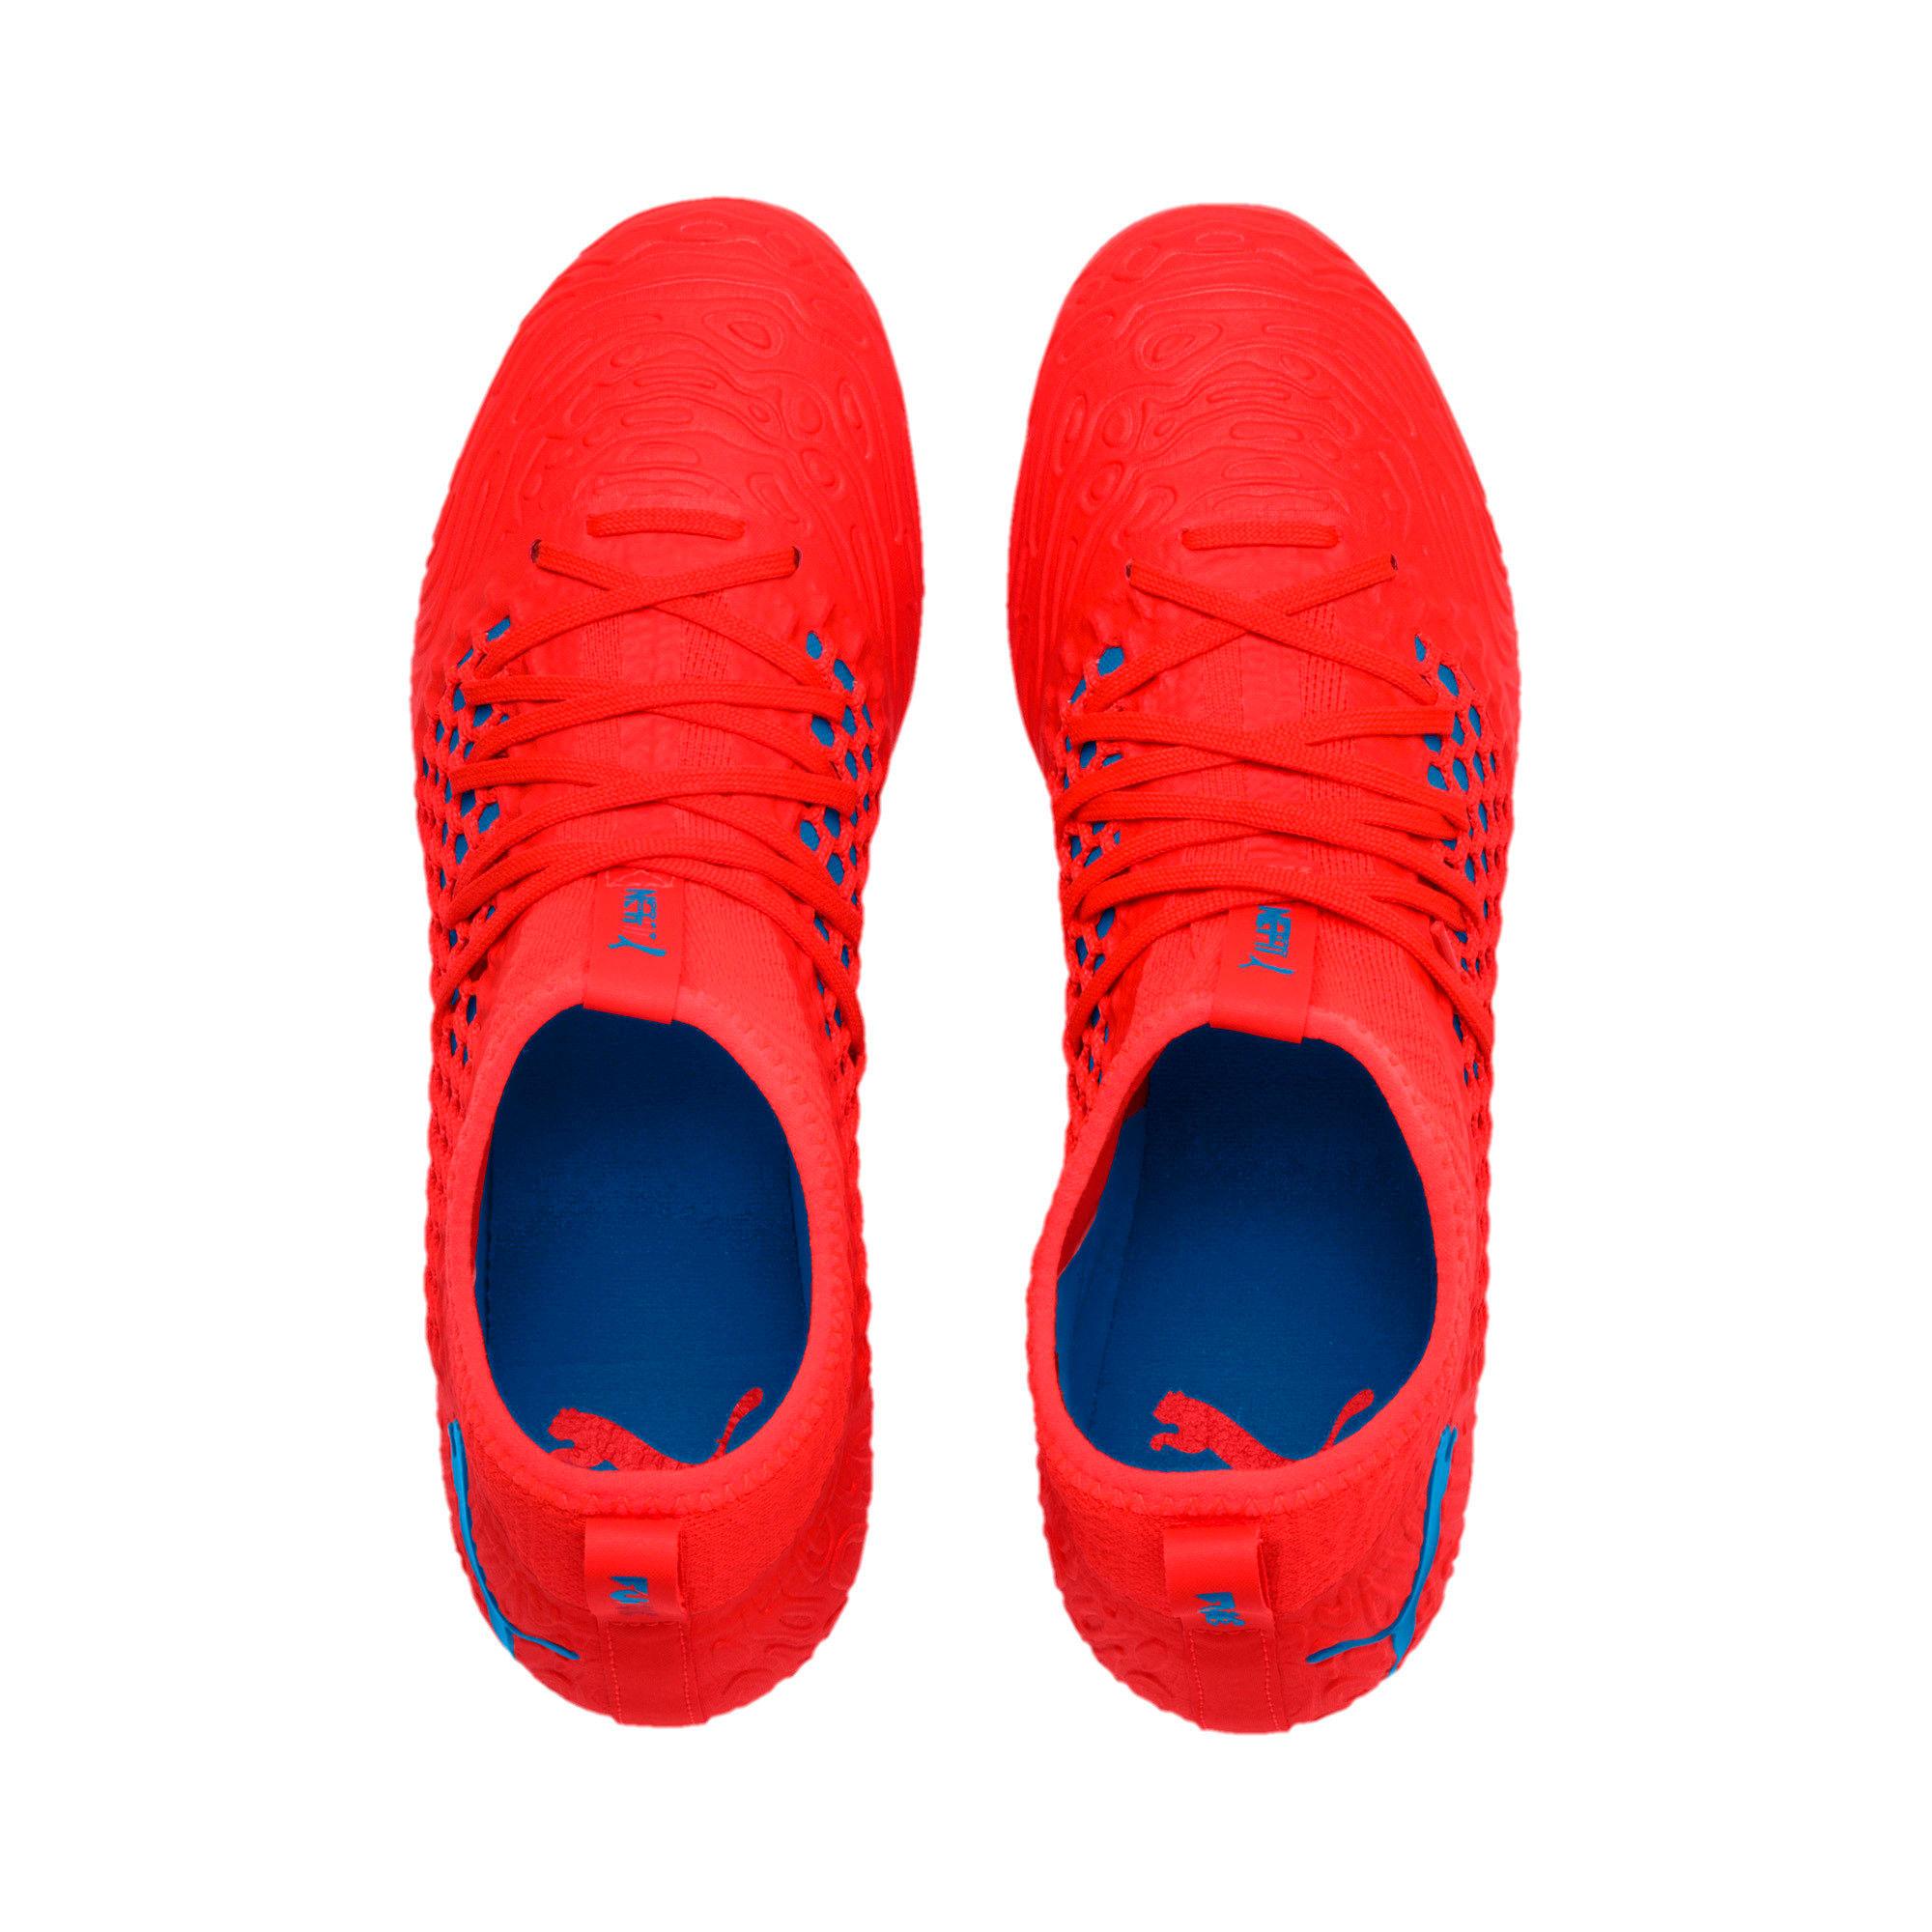 Thumbnail 6 of FUTURE 19.3 NETFIT FG/AG Men's Football Boots, Red Blast-Bleu Azur, medium-IND